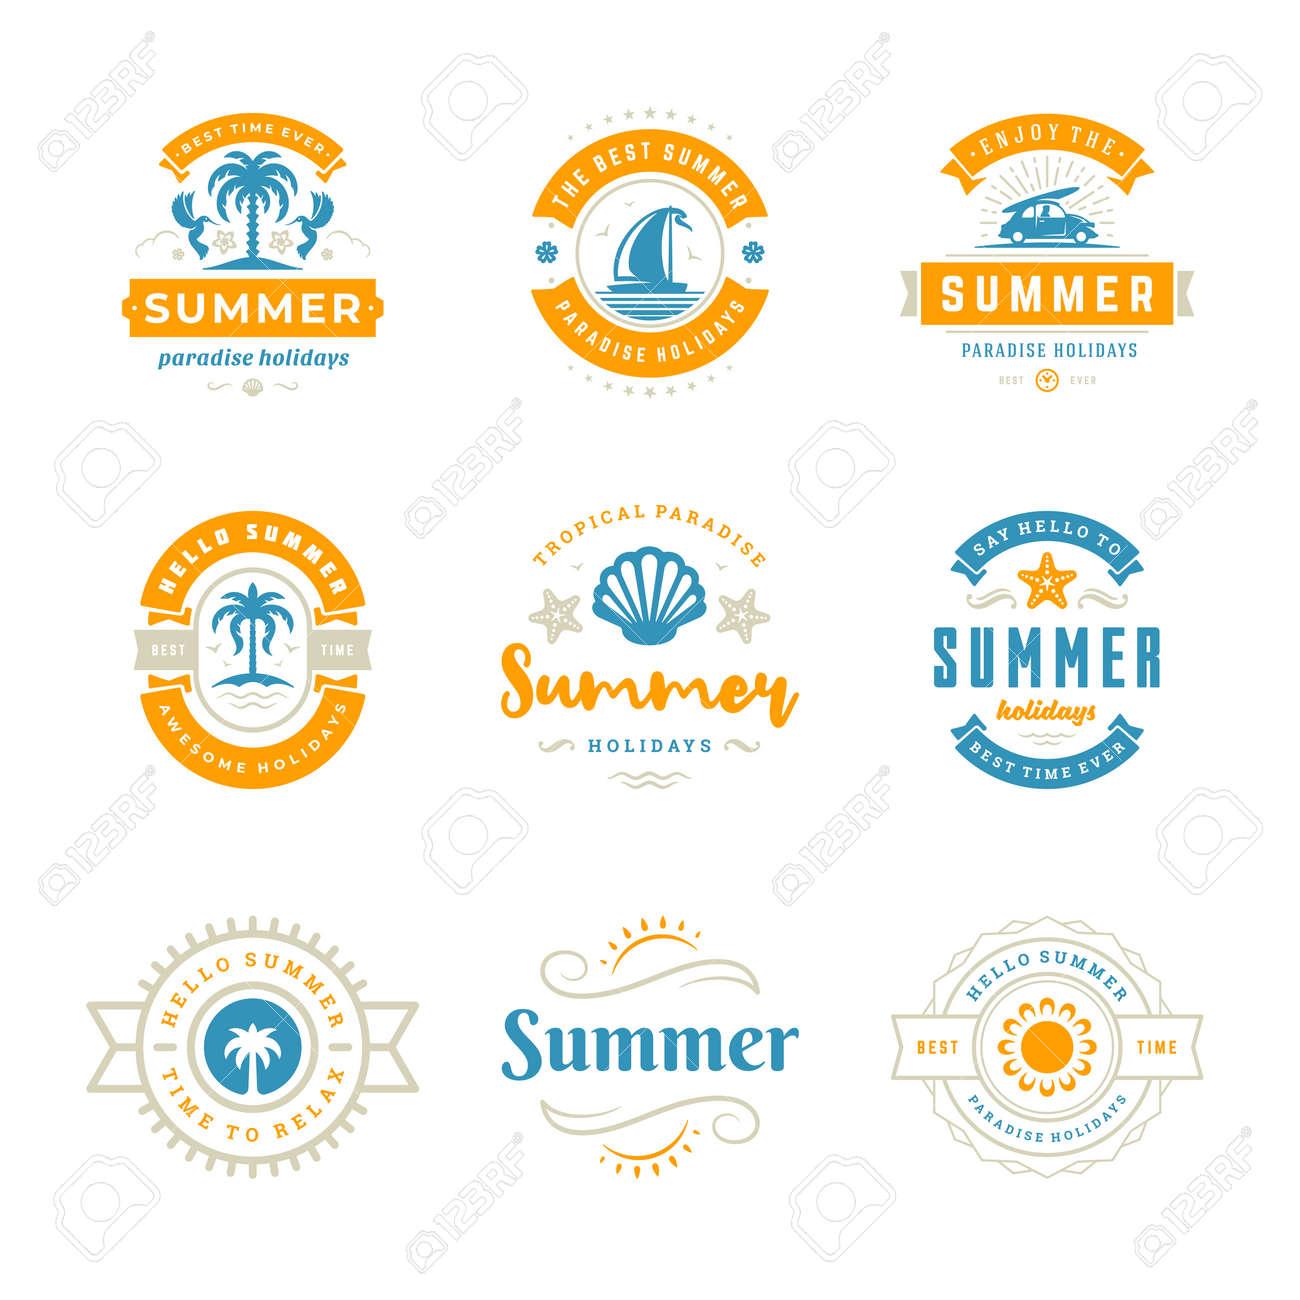 Summer holidays labels and badges retro typography design set. - 169500522